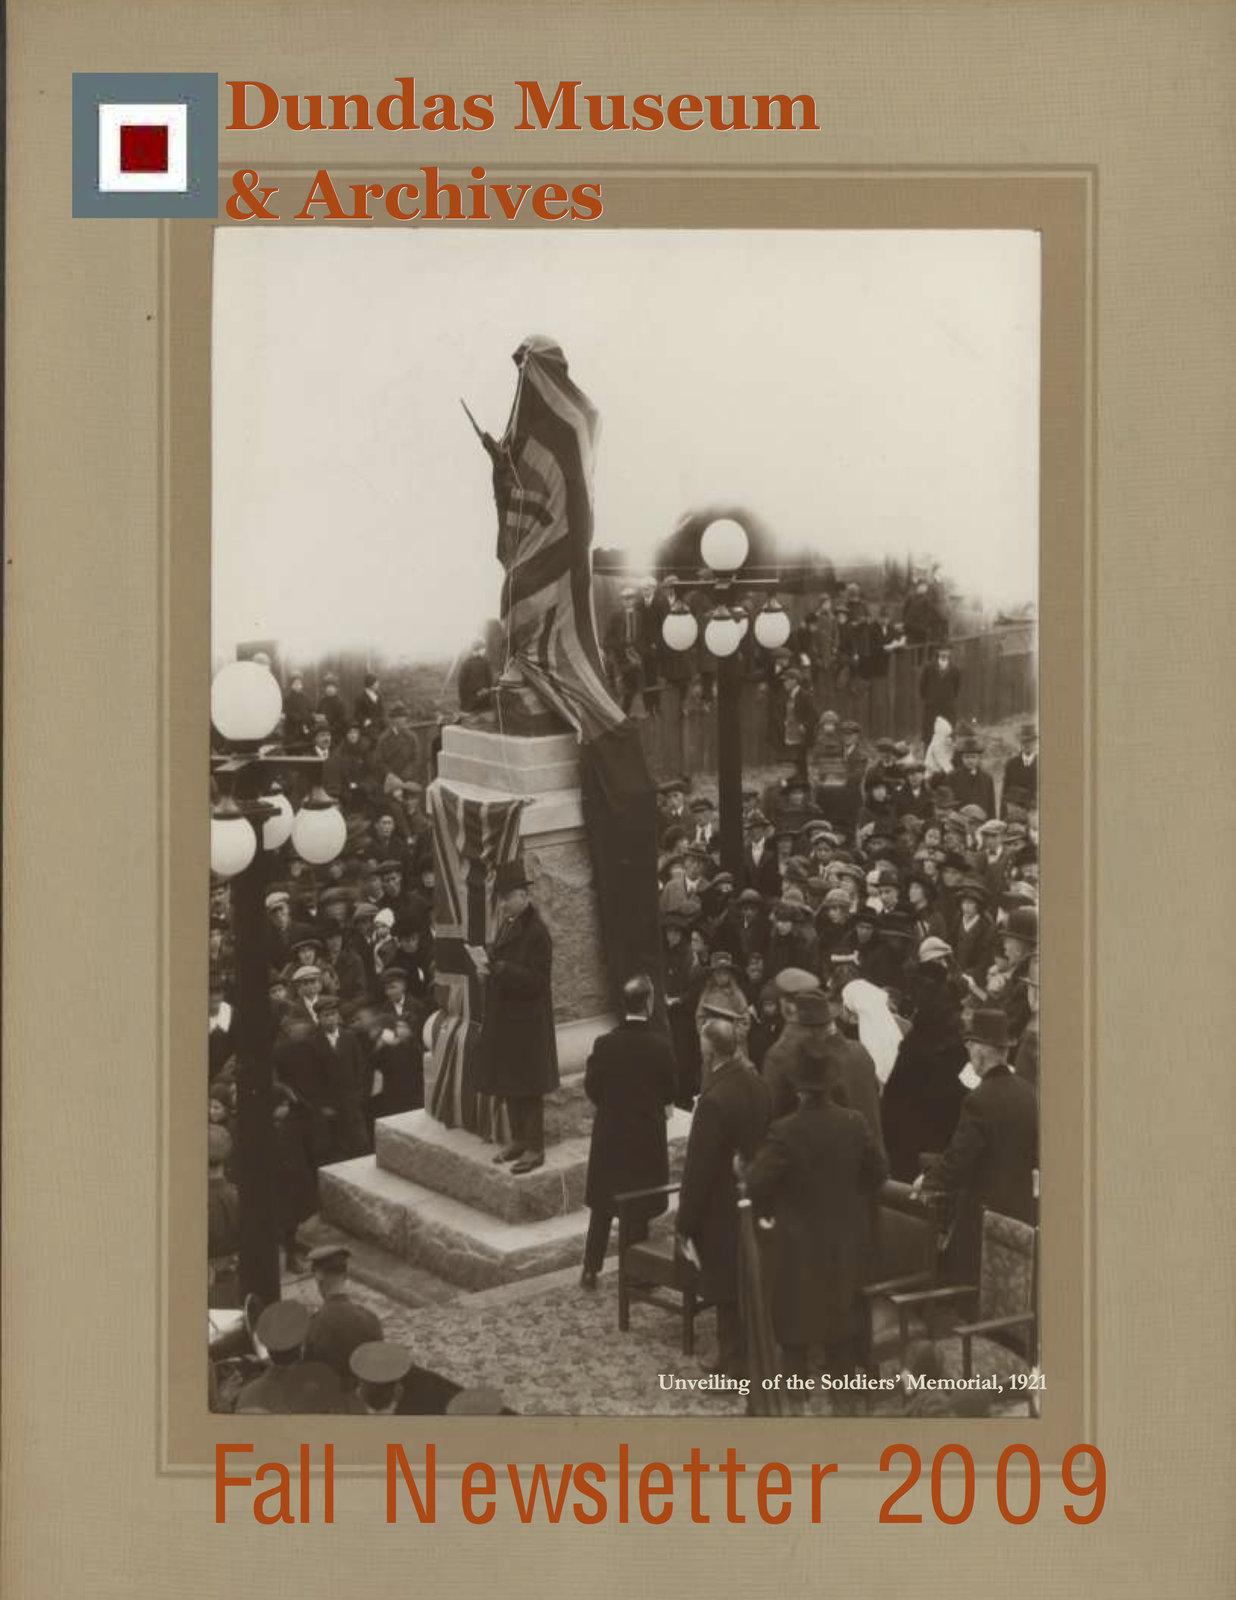 Dundas Museum & Archives, Fall Newsletter 2009